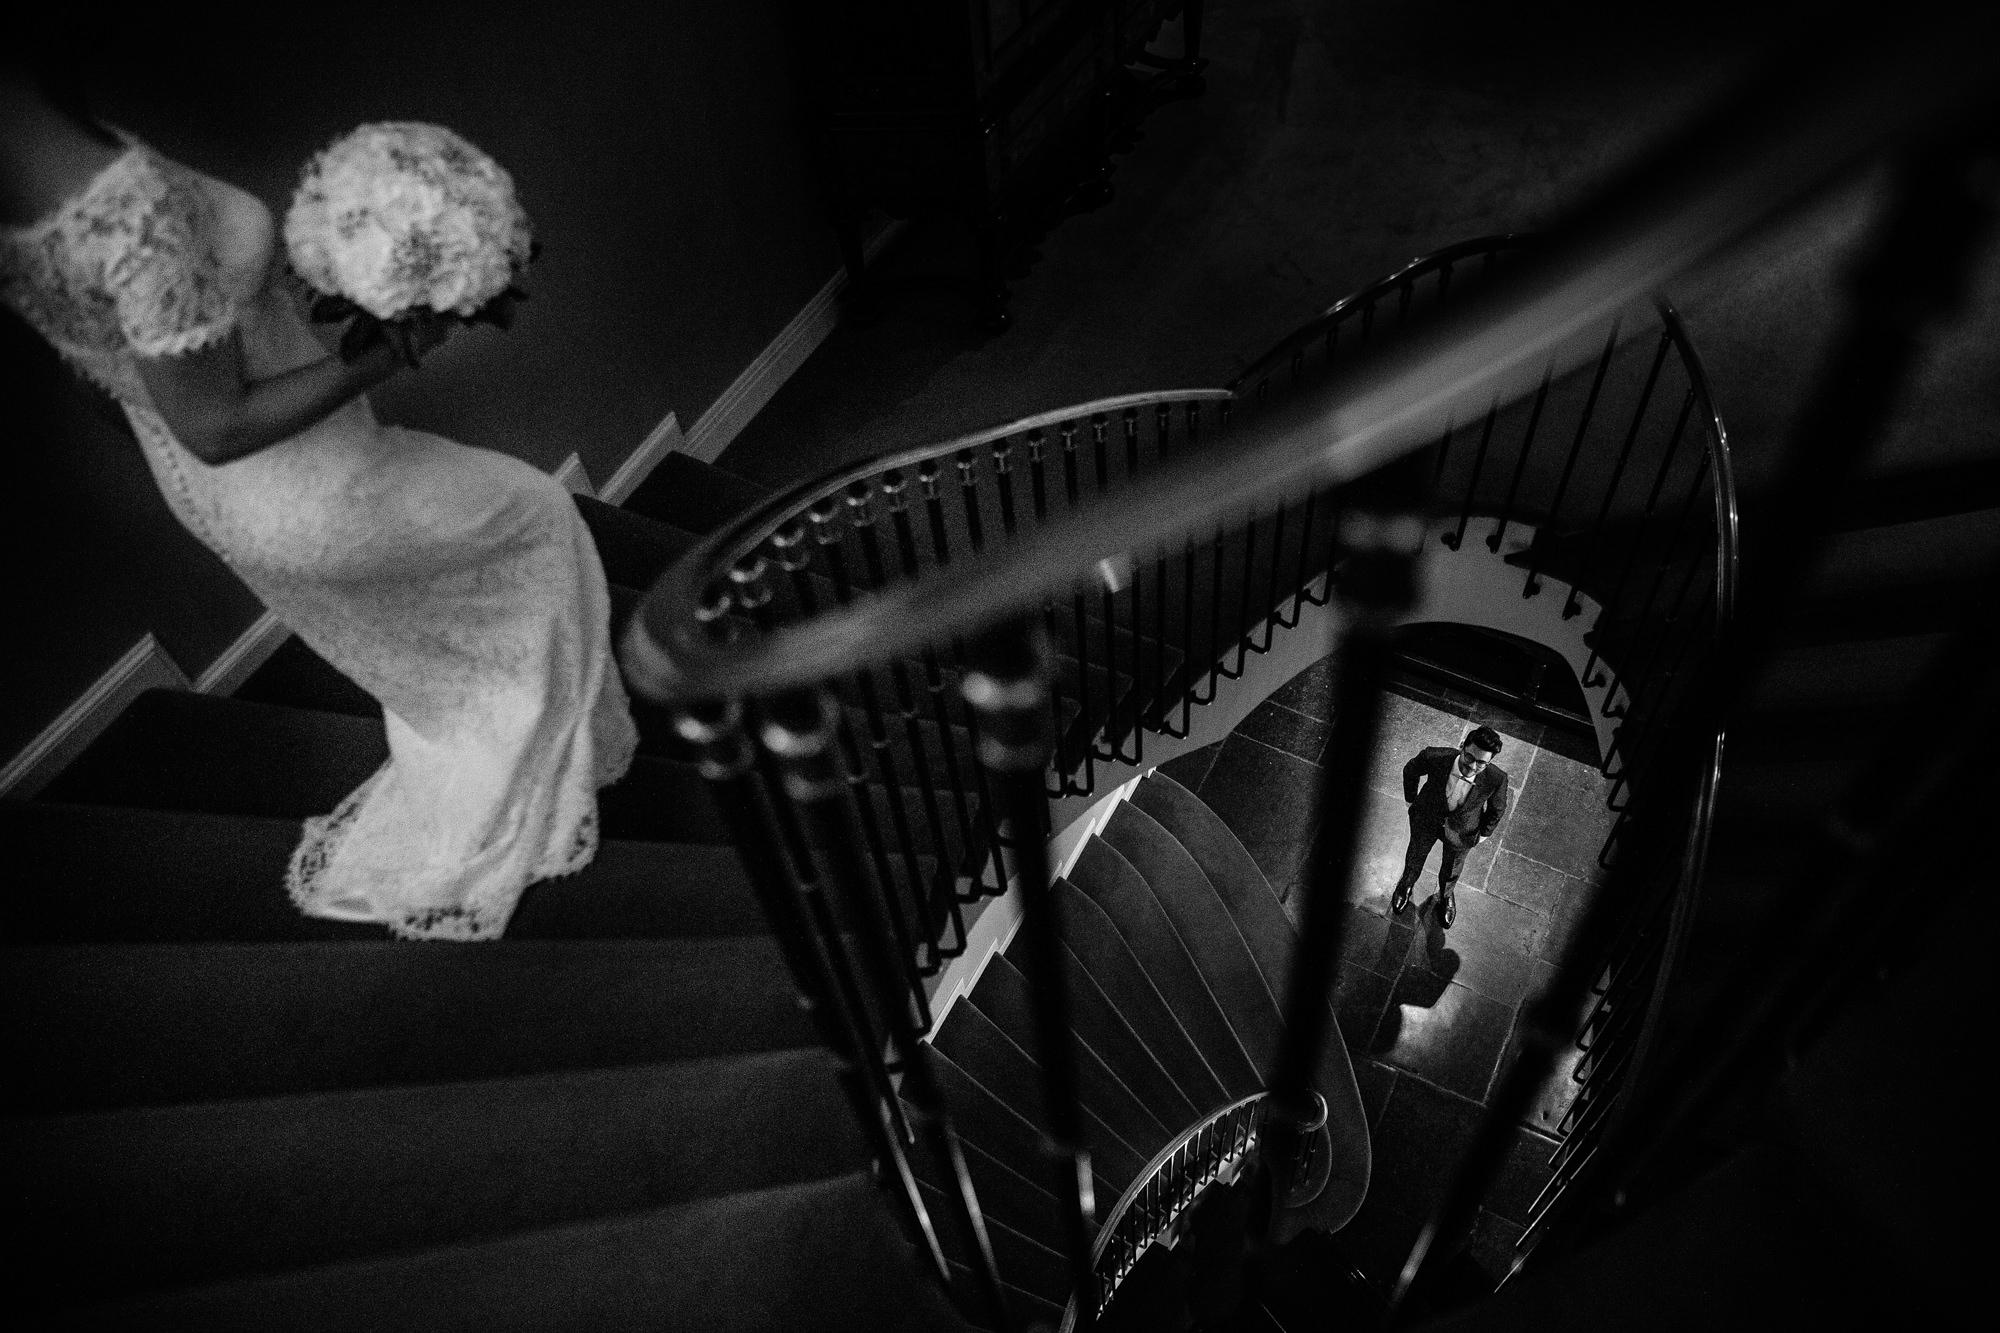 first-look-bride-descends-stairs-to-groom-worlds-best-wedding-photos-yves-schepers-belgium-wedding-photographers